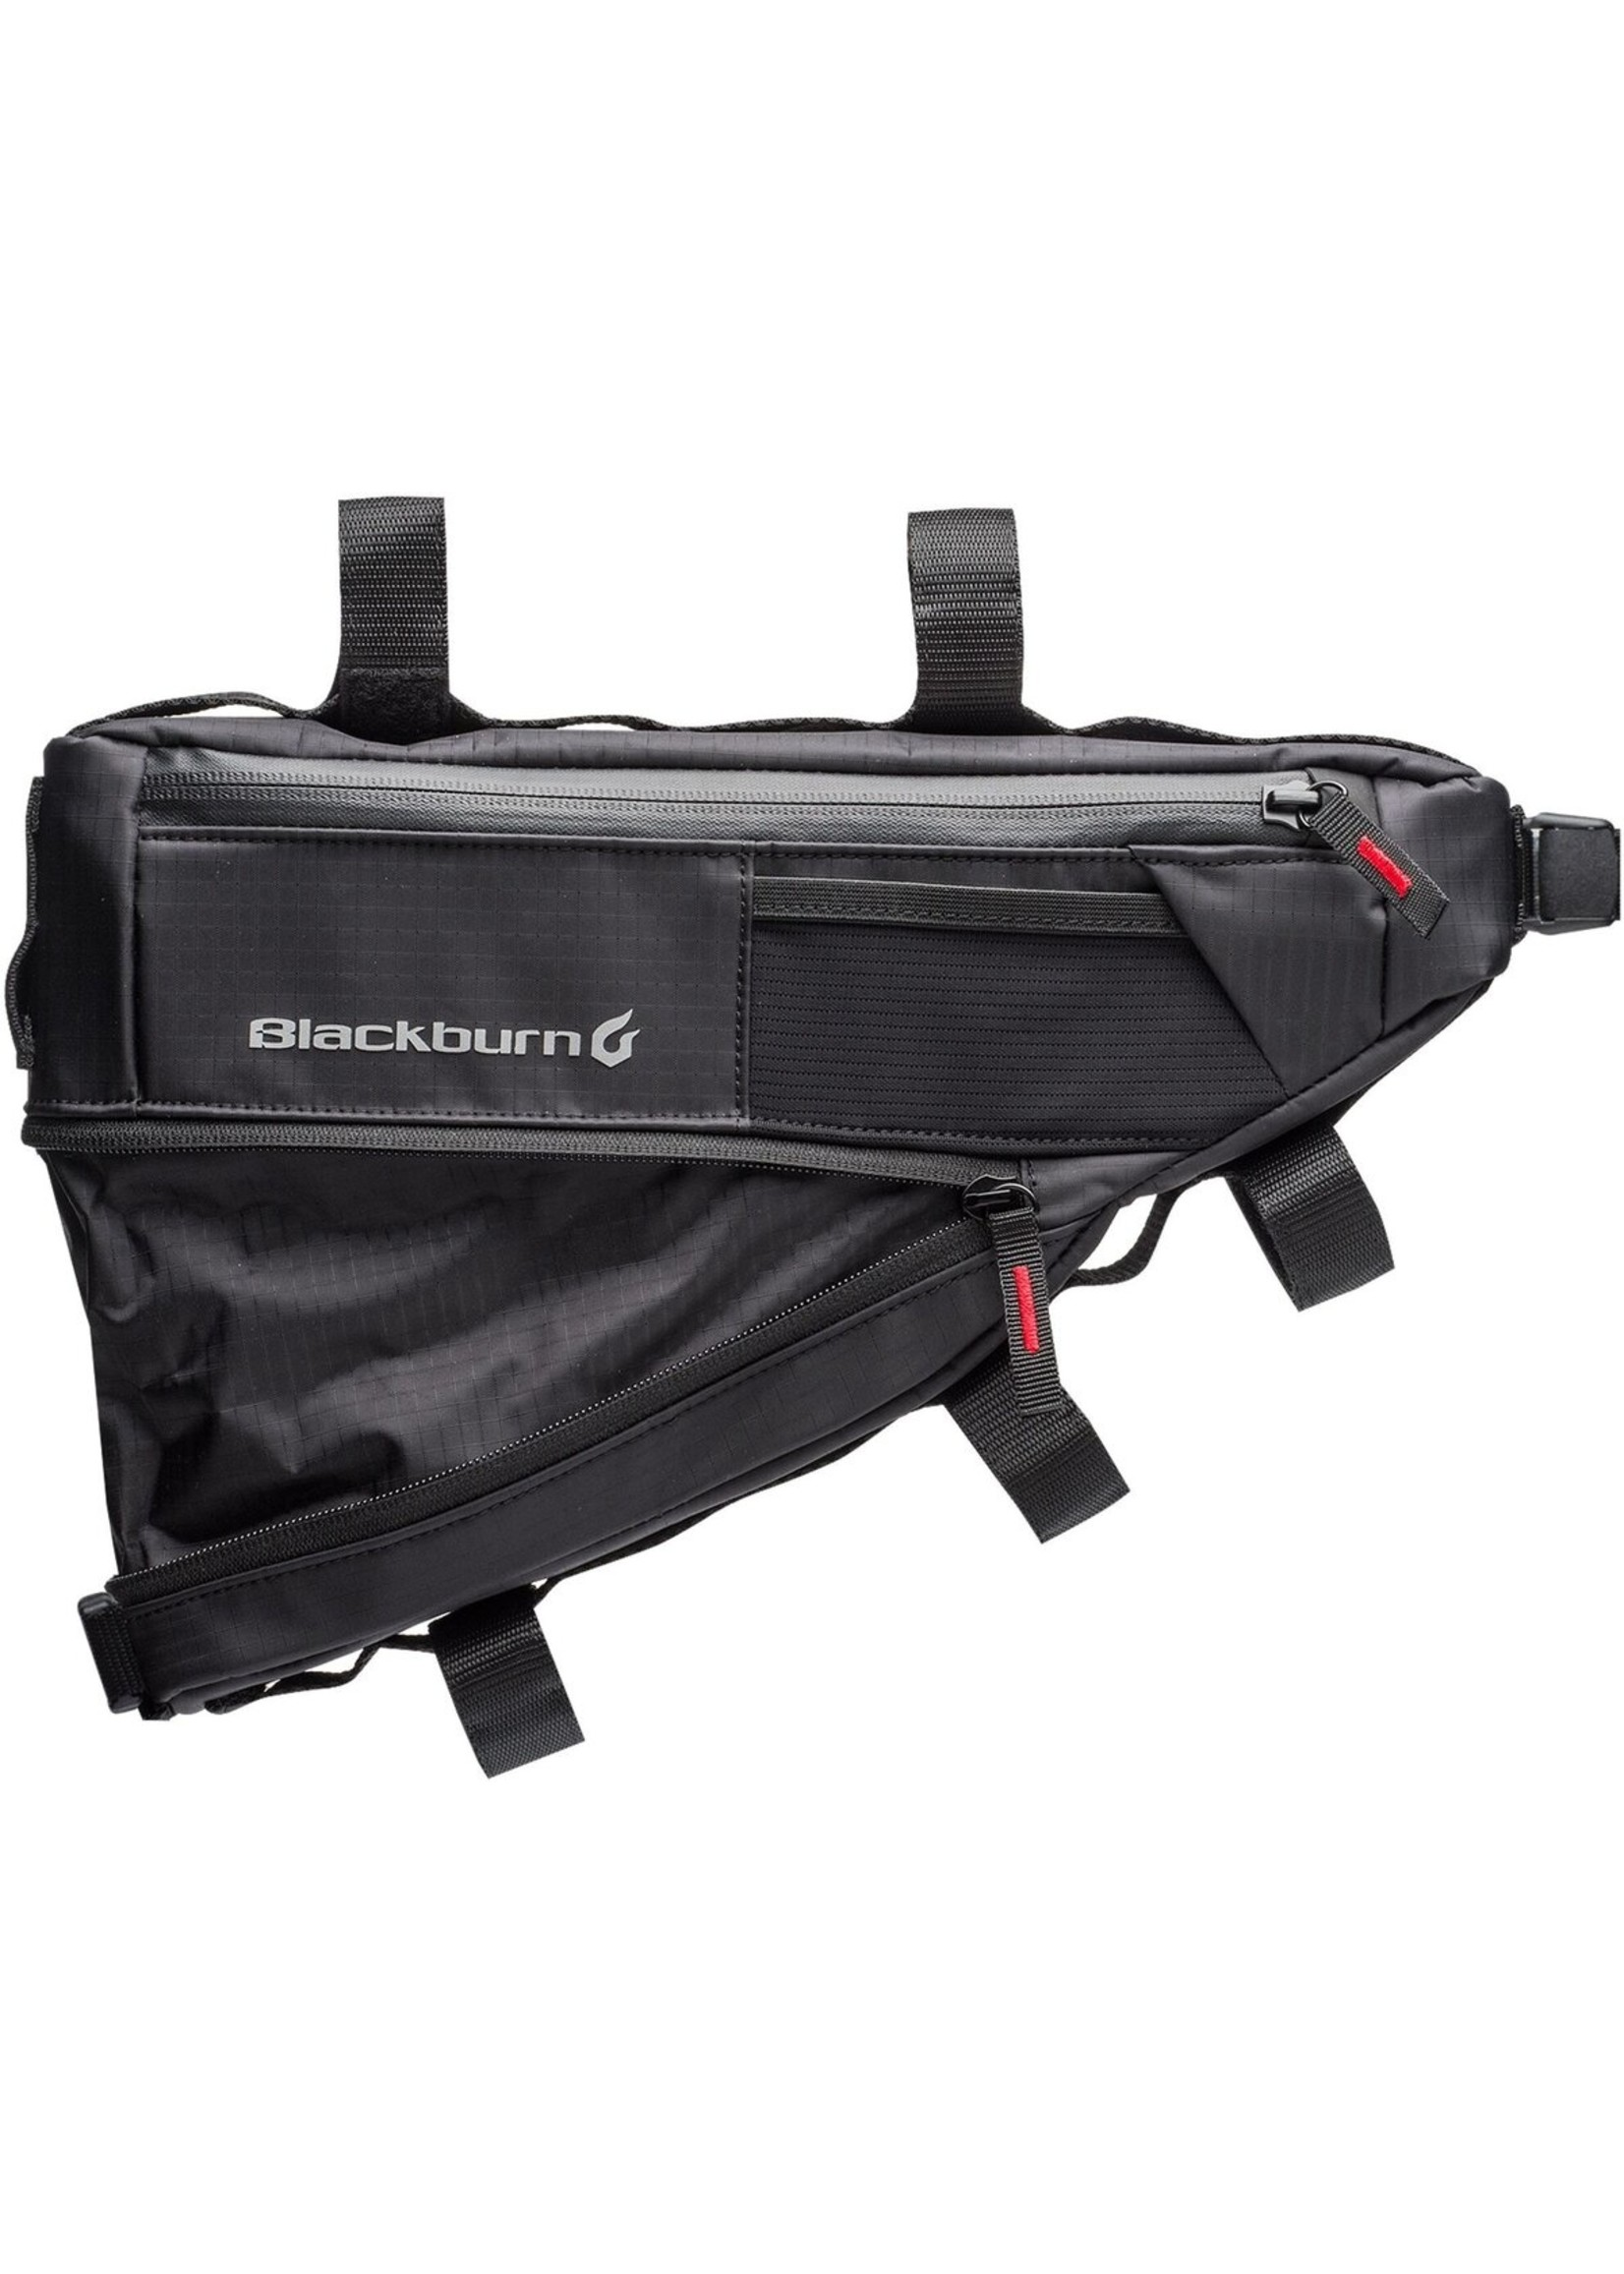 BlackBurn Blackburn- Outpost Frame Bag, Medium, Digicamo